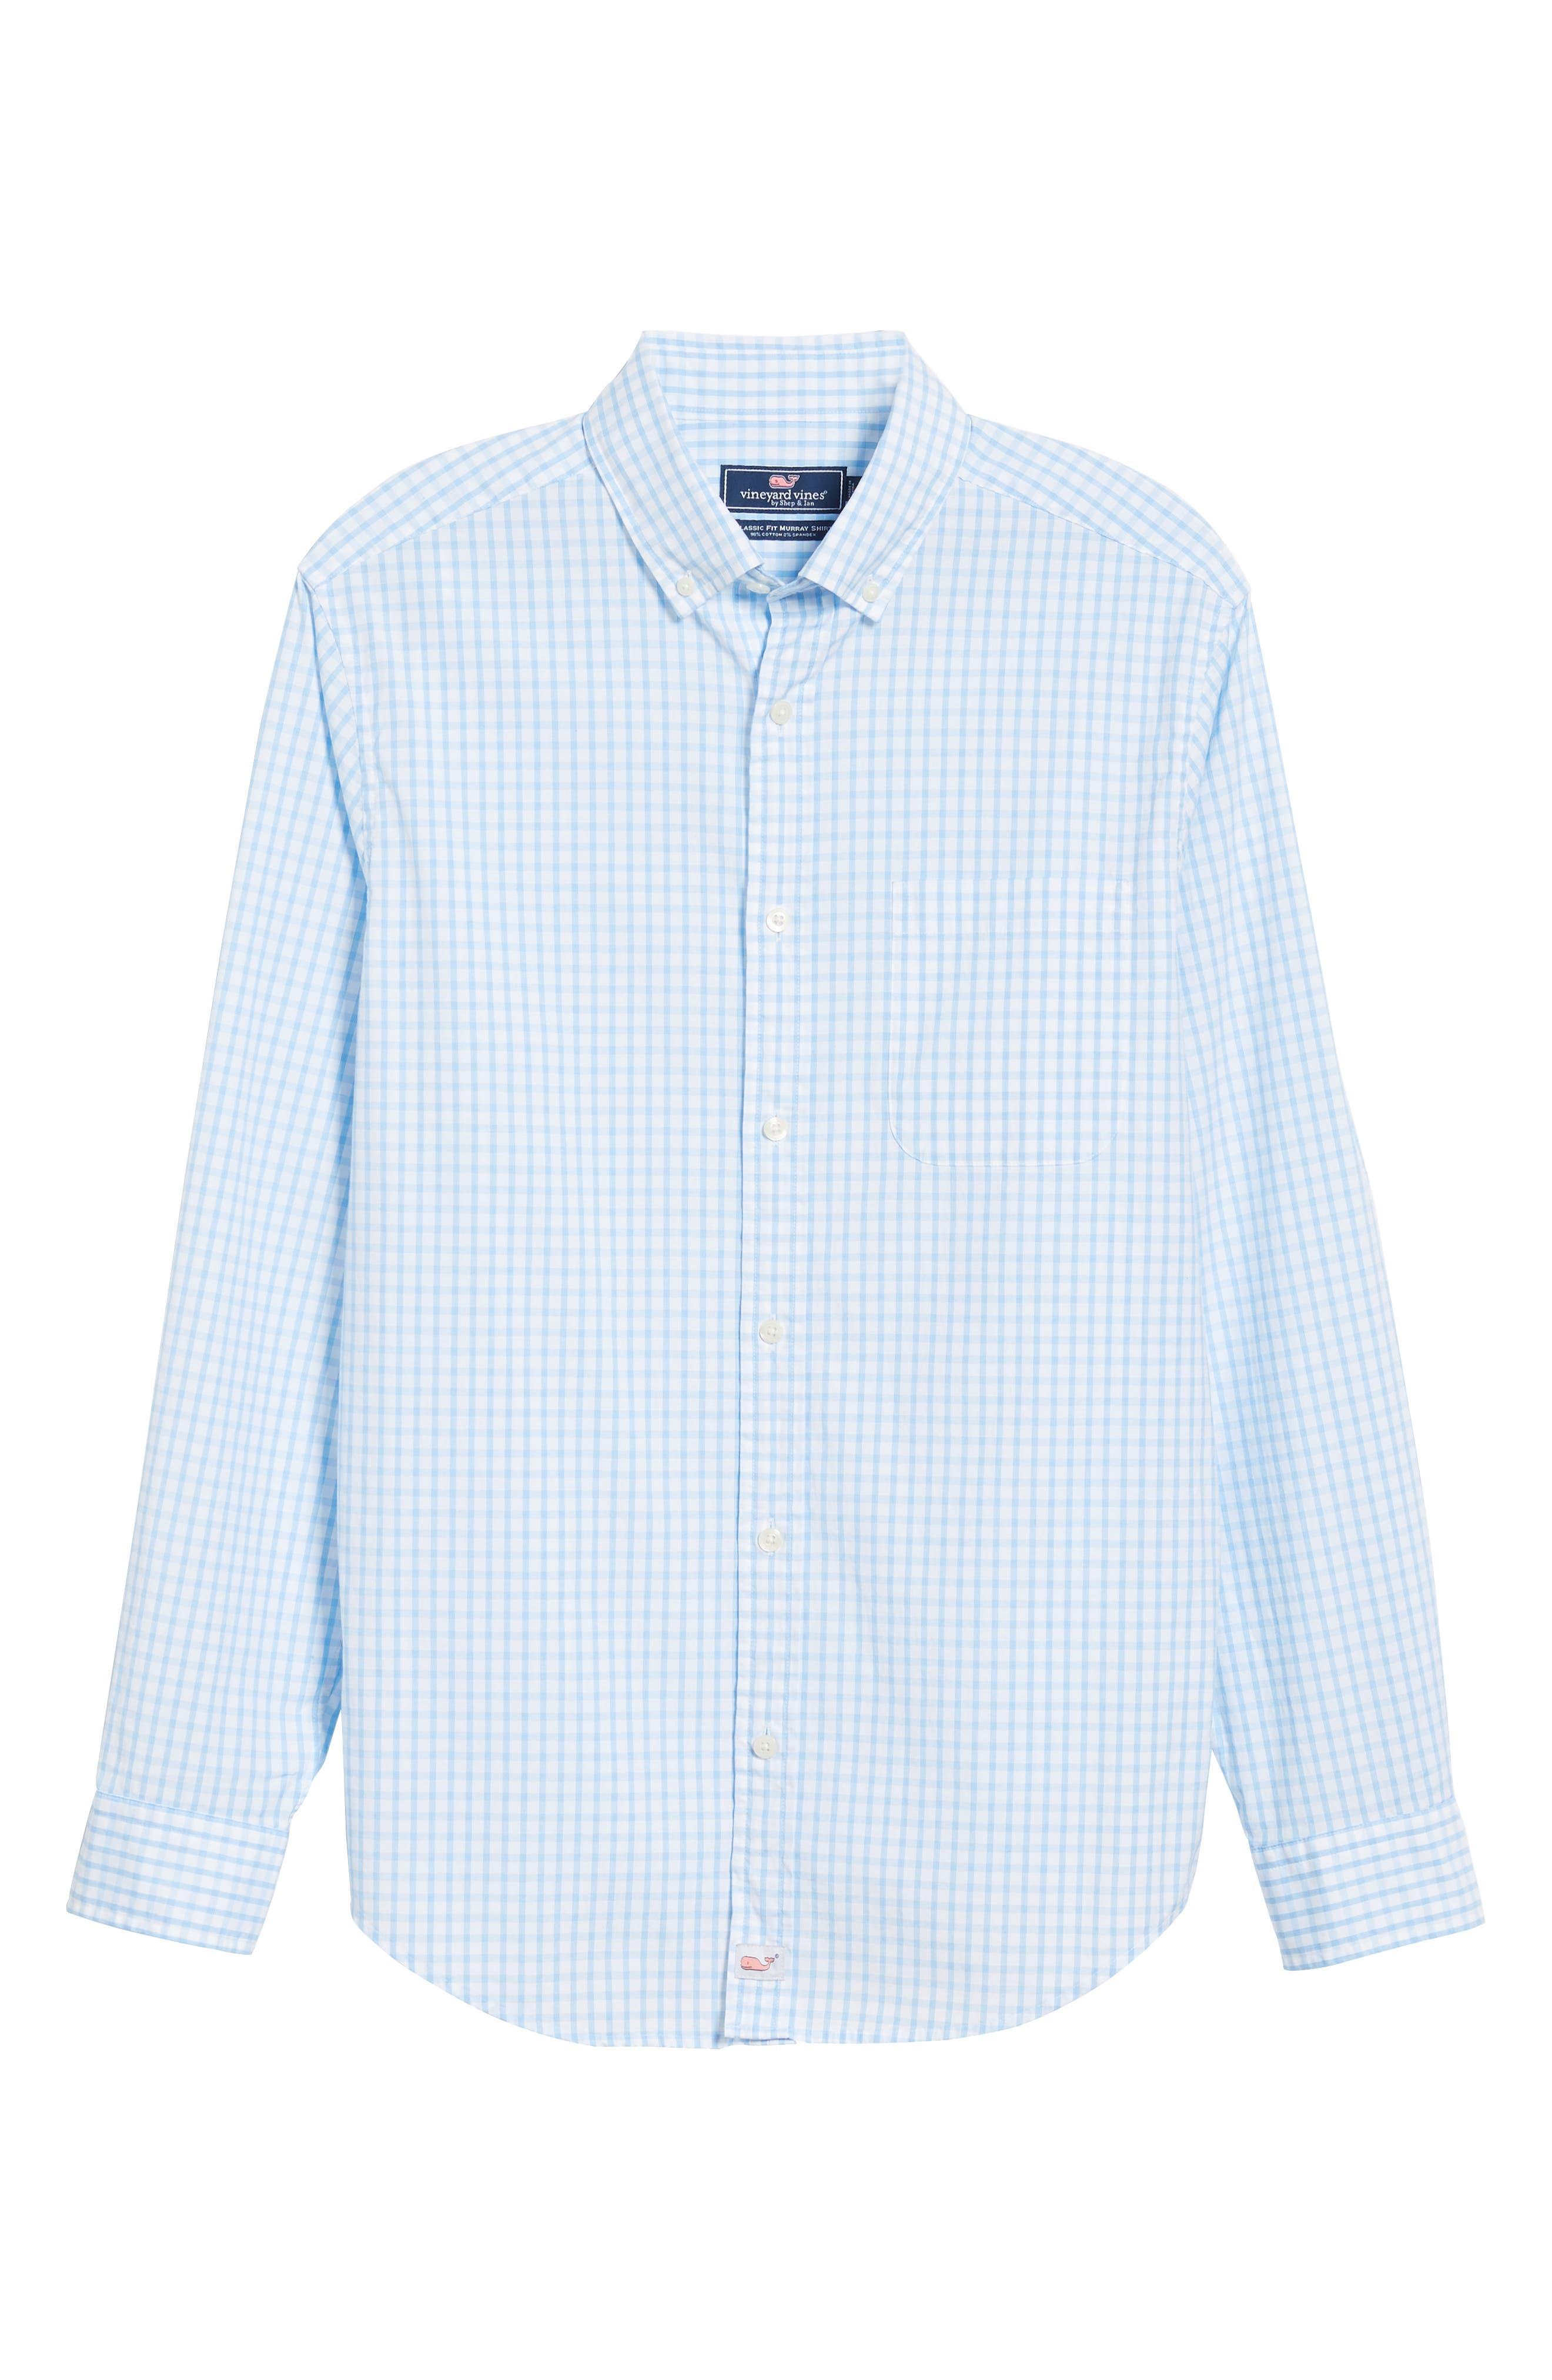 VINEYARD VINES, Micro Graph Classic Fit Check Sport Shirt, Alternate thumbnail 5, color, OCEAN BREEZE